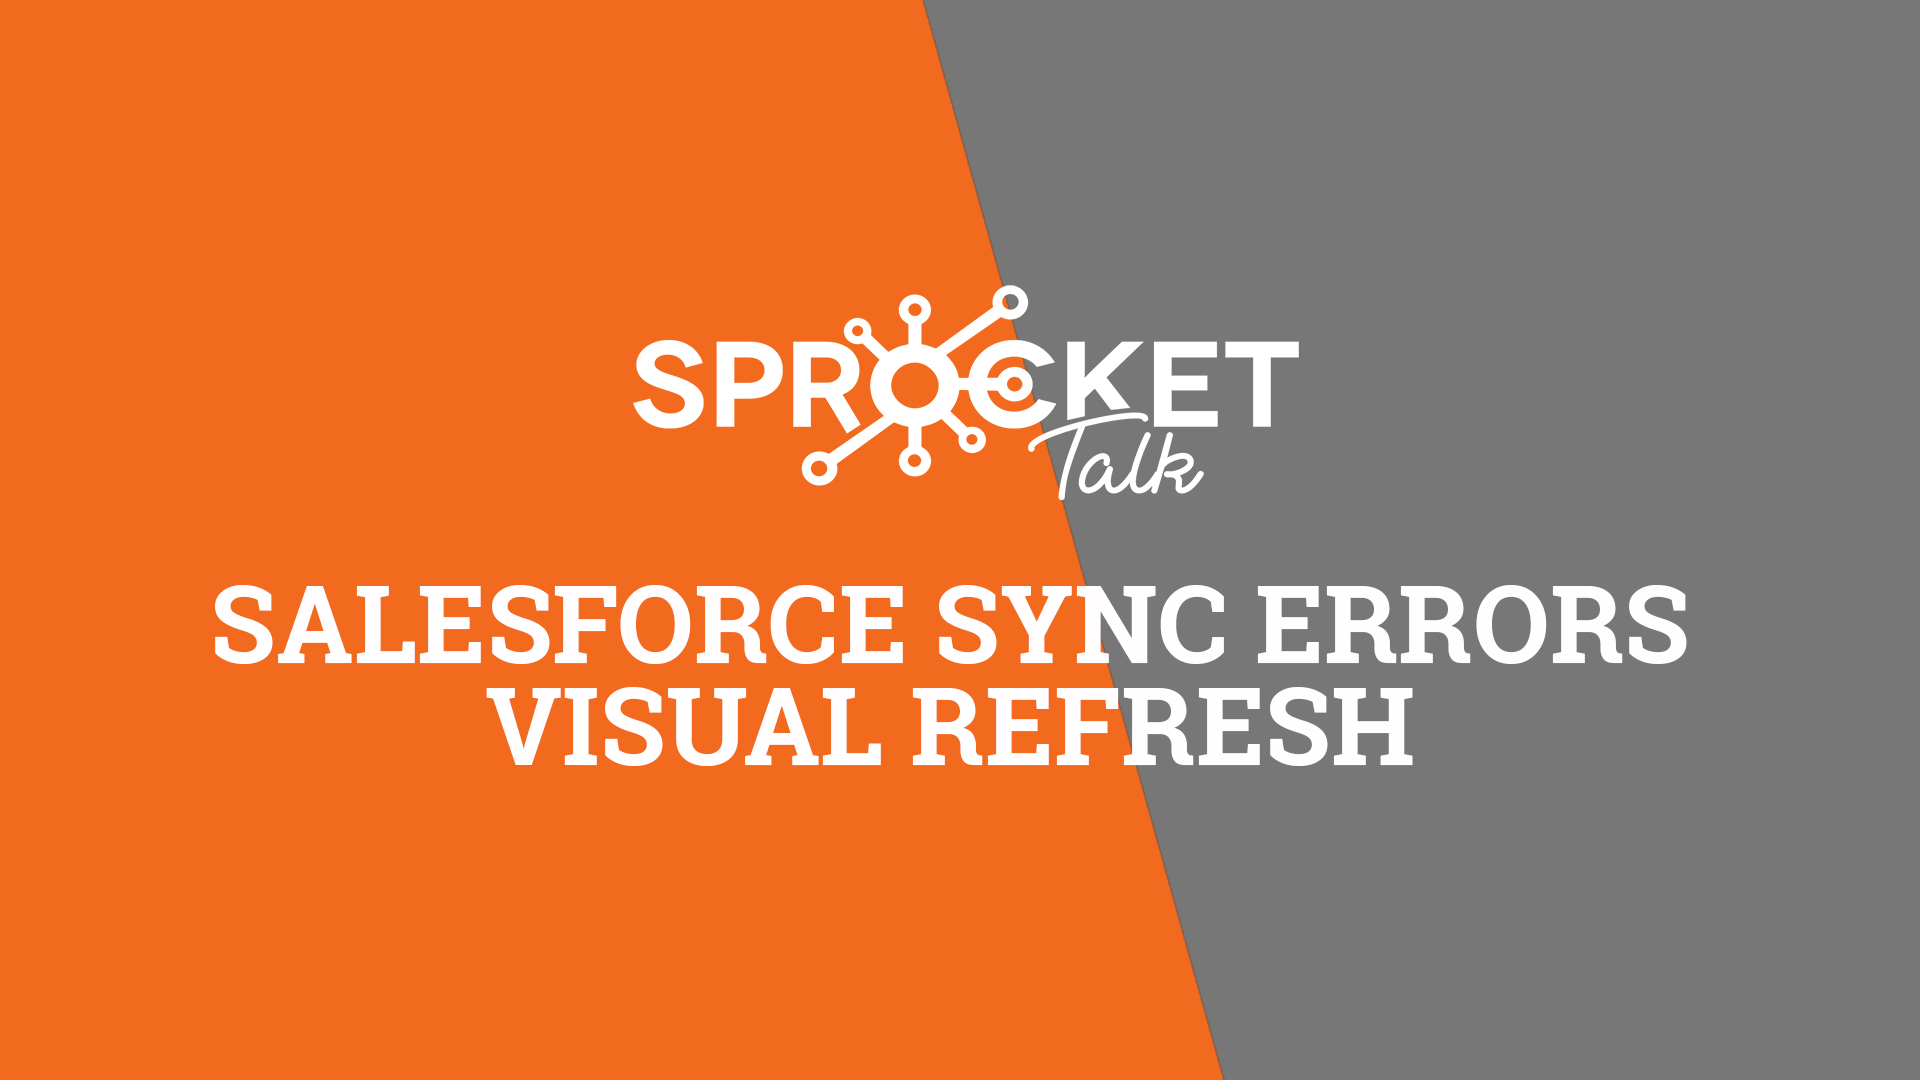 Salesforce Sync Errors Visual Refresh